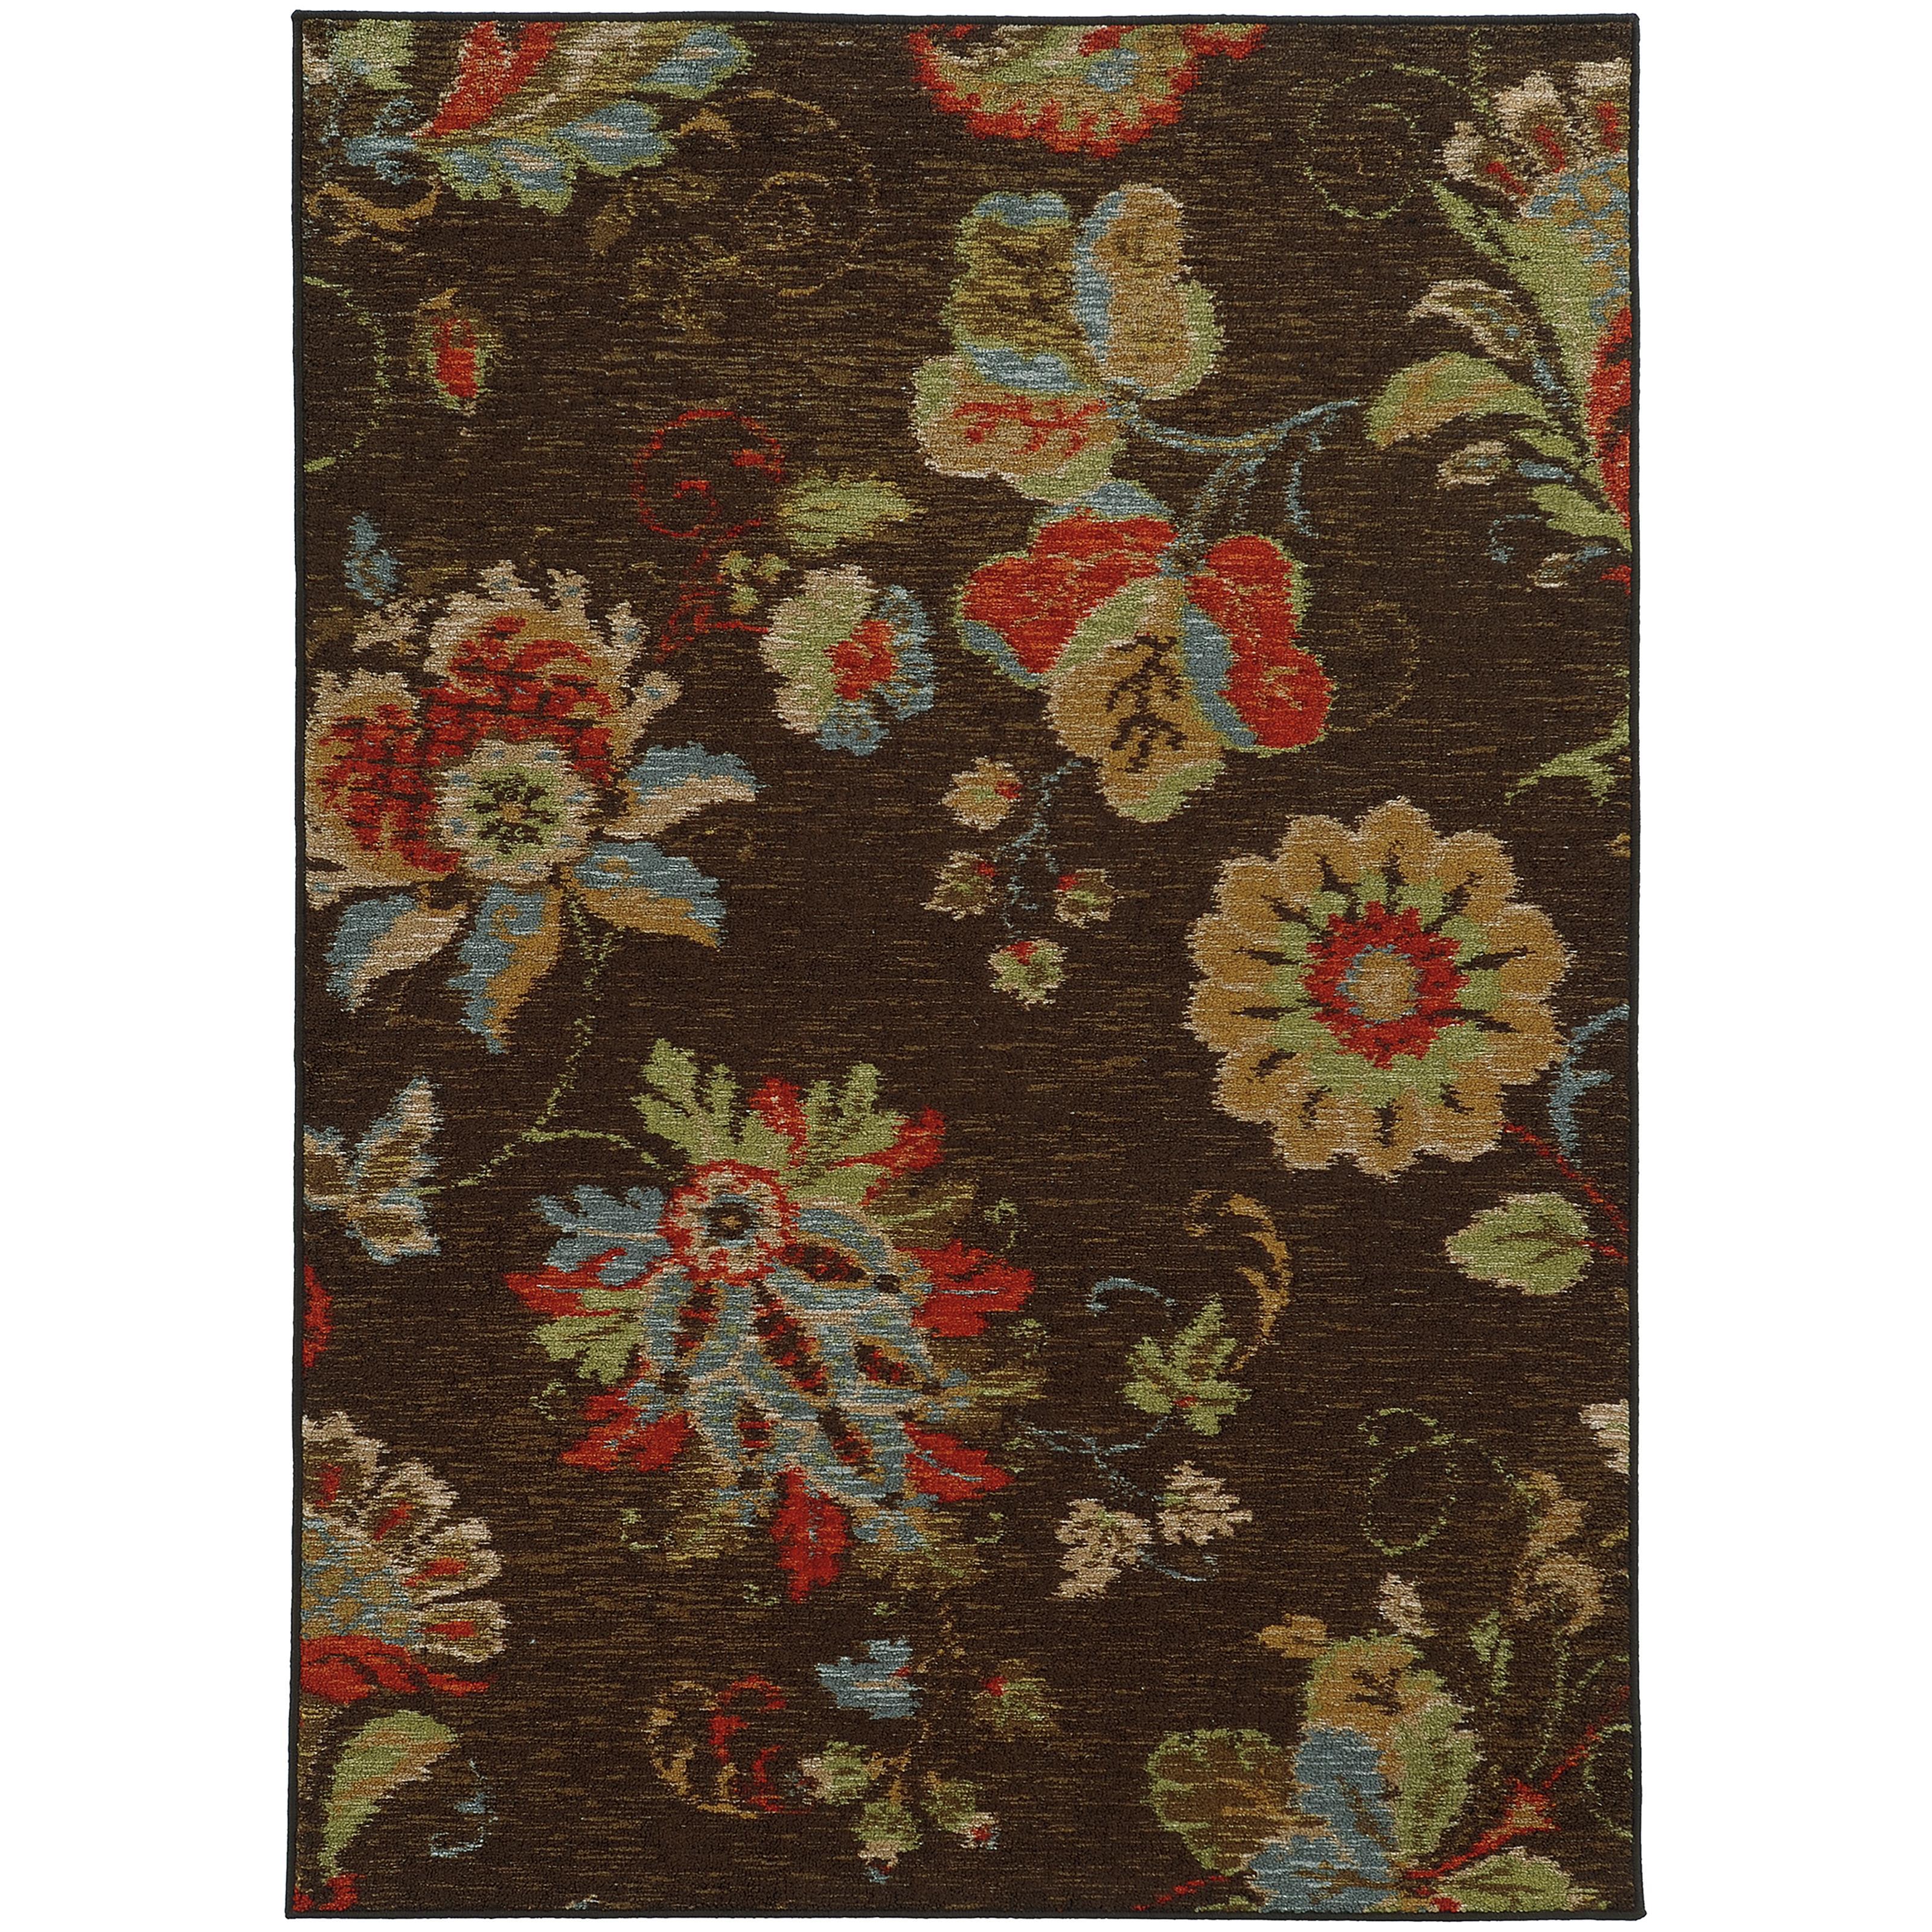 "Arabella 3' 3"" X  5' 5"" Rug by Oriental Weavers at Steger's Furniture"